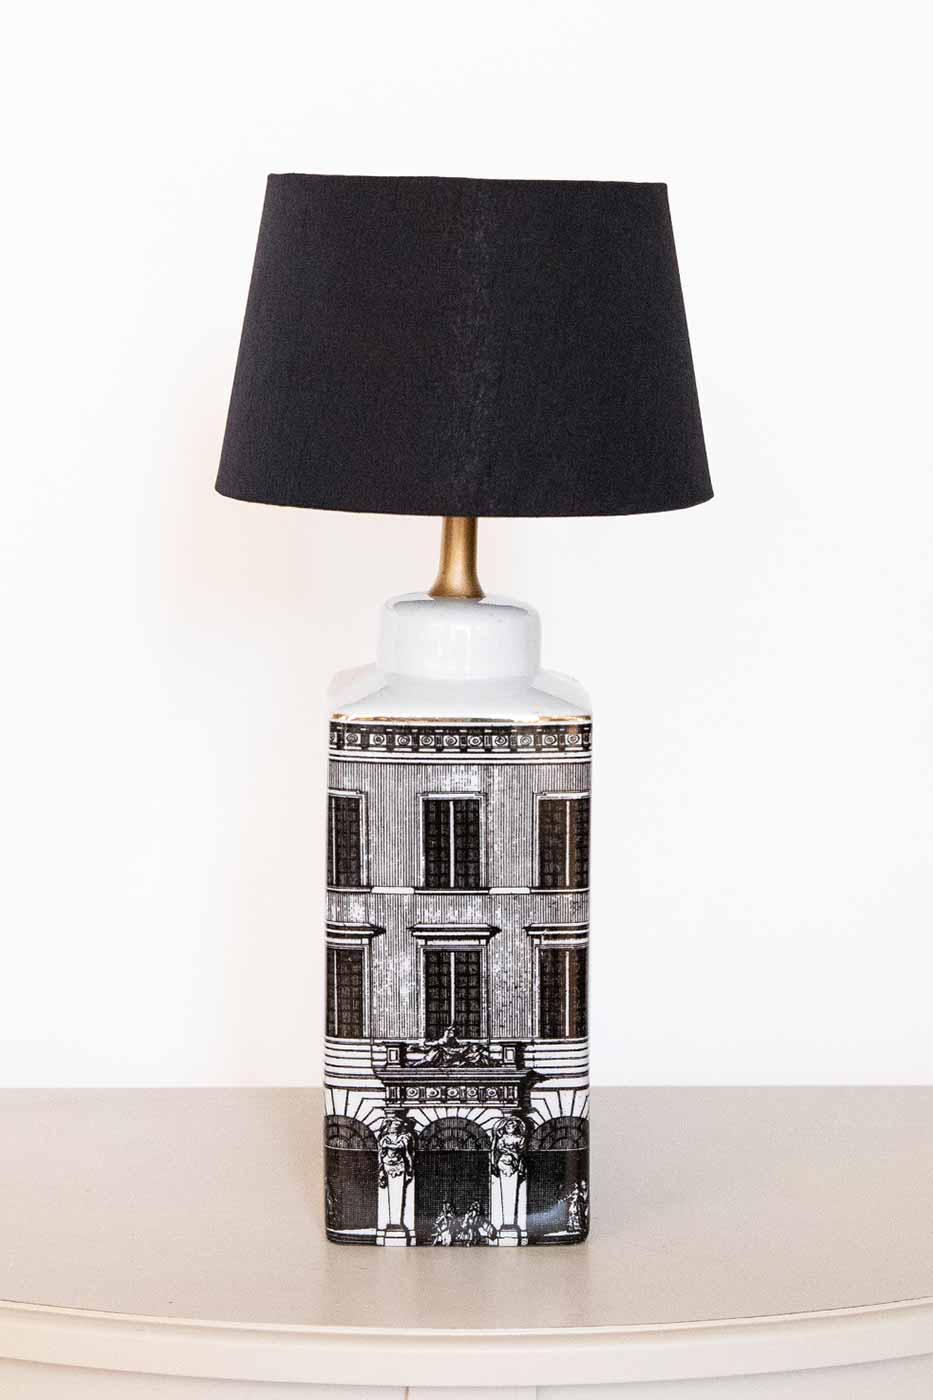 Lampfot Tessinska Palatset 35 cm